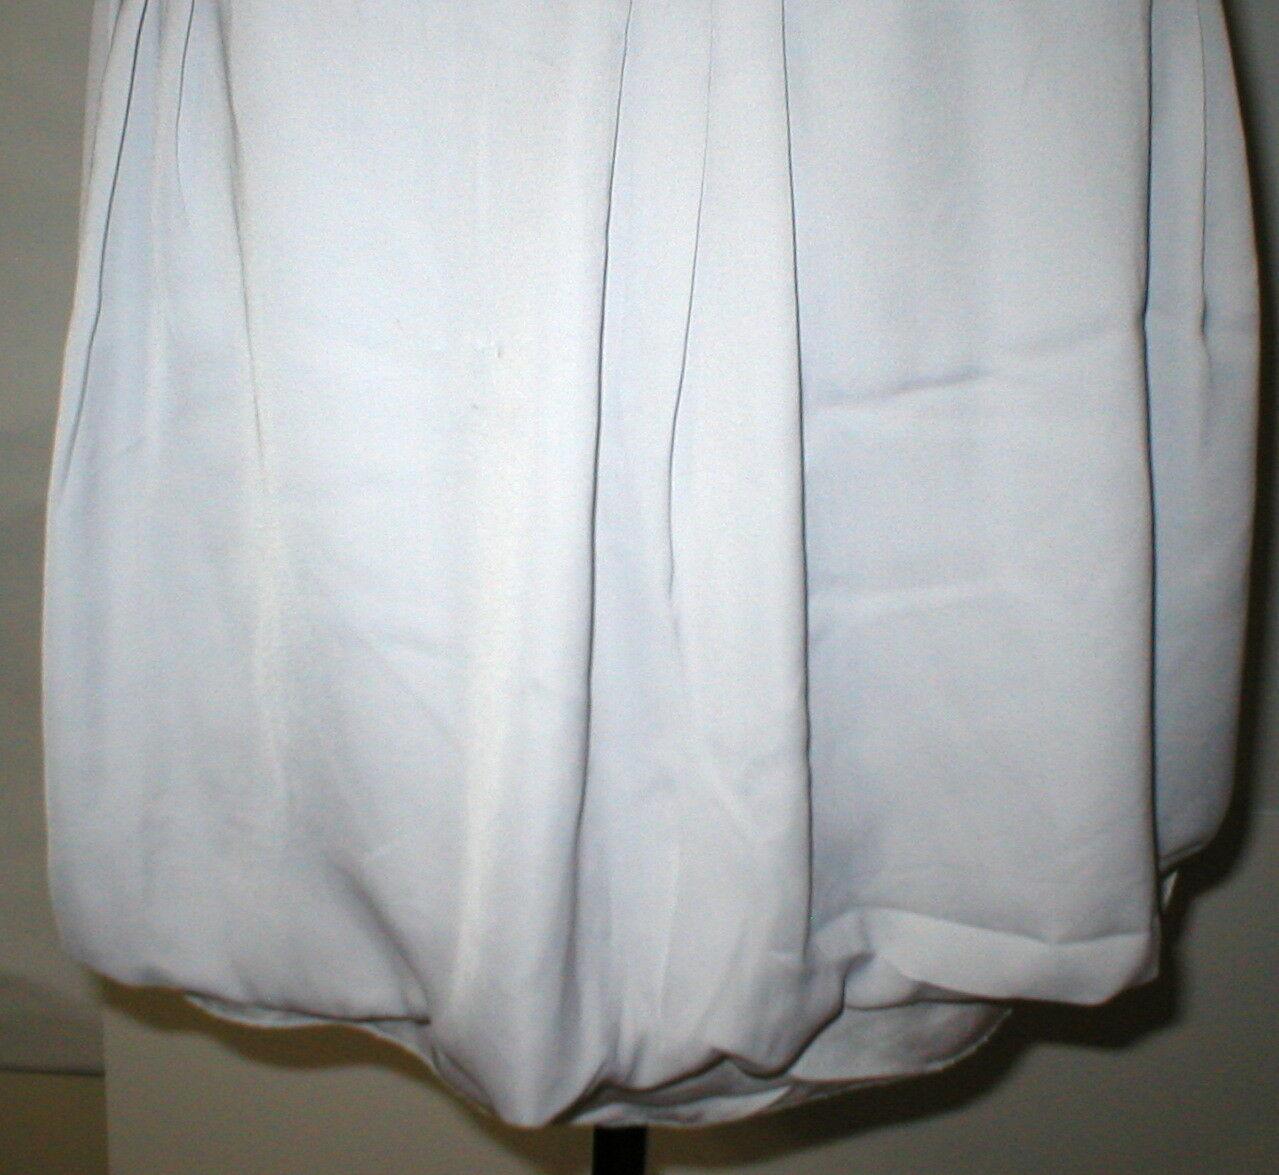 NEW Womens Gap Bubble $50 Skirt NWT 14 Mini Starlight Very light Grayish Purple image 6